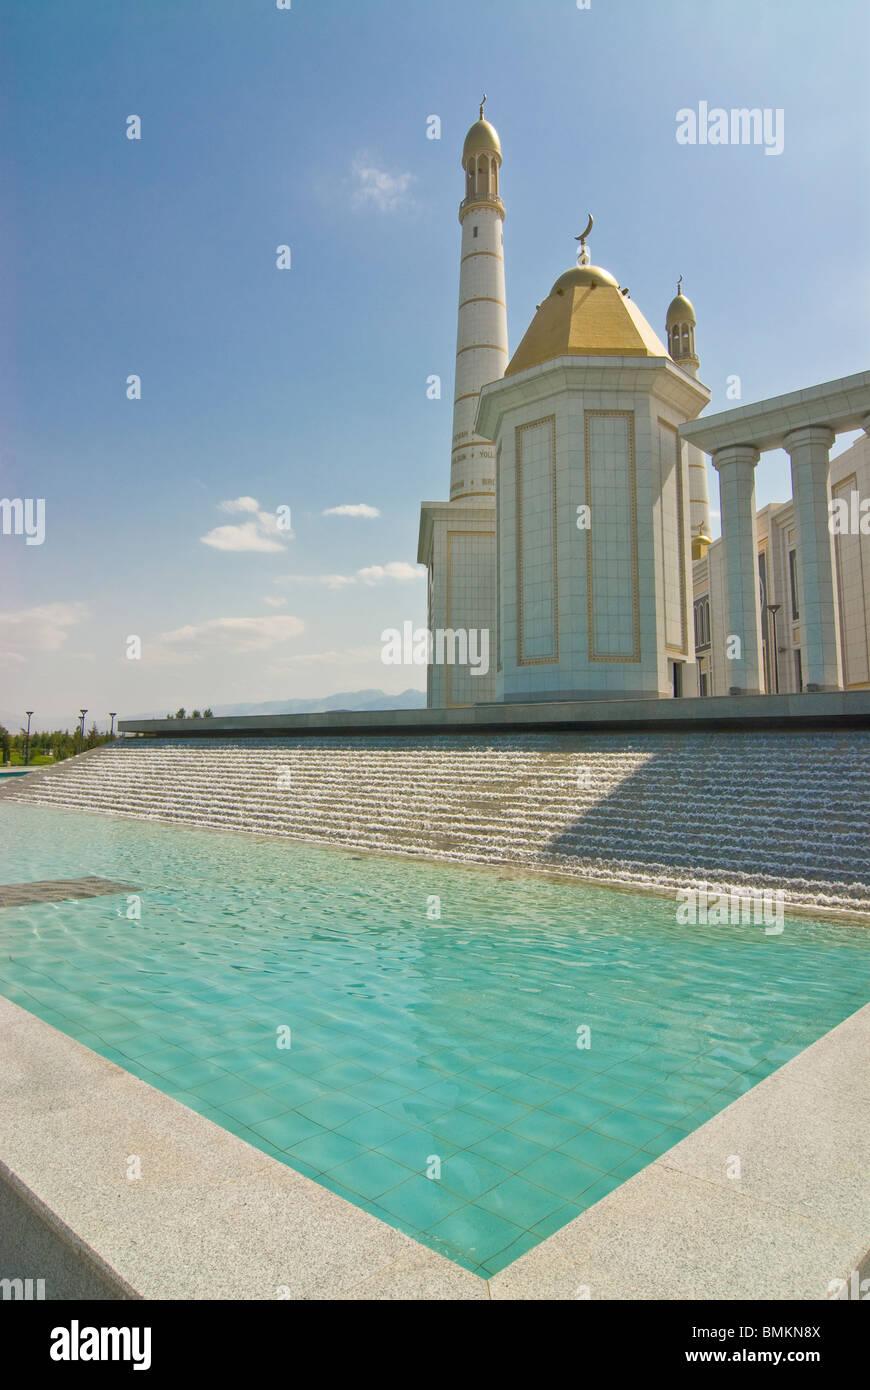 Turkmenbashi Ruhi Mosque, Turkmenistan - Stock Image